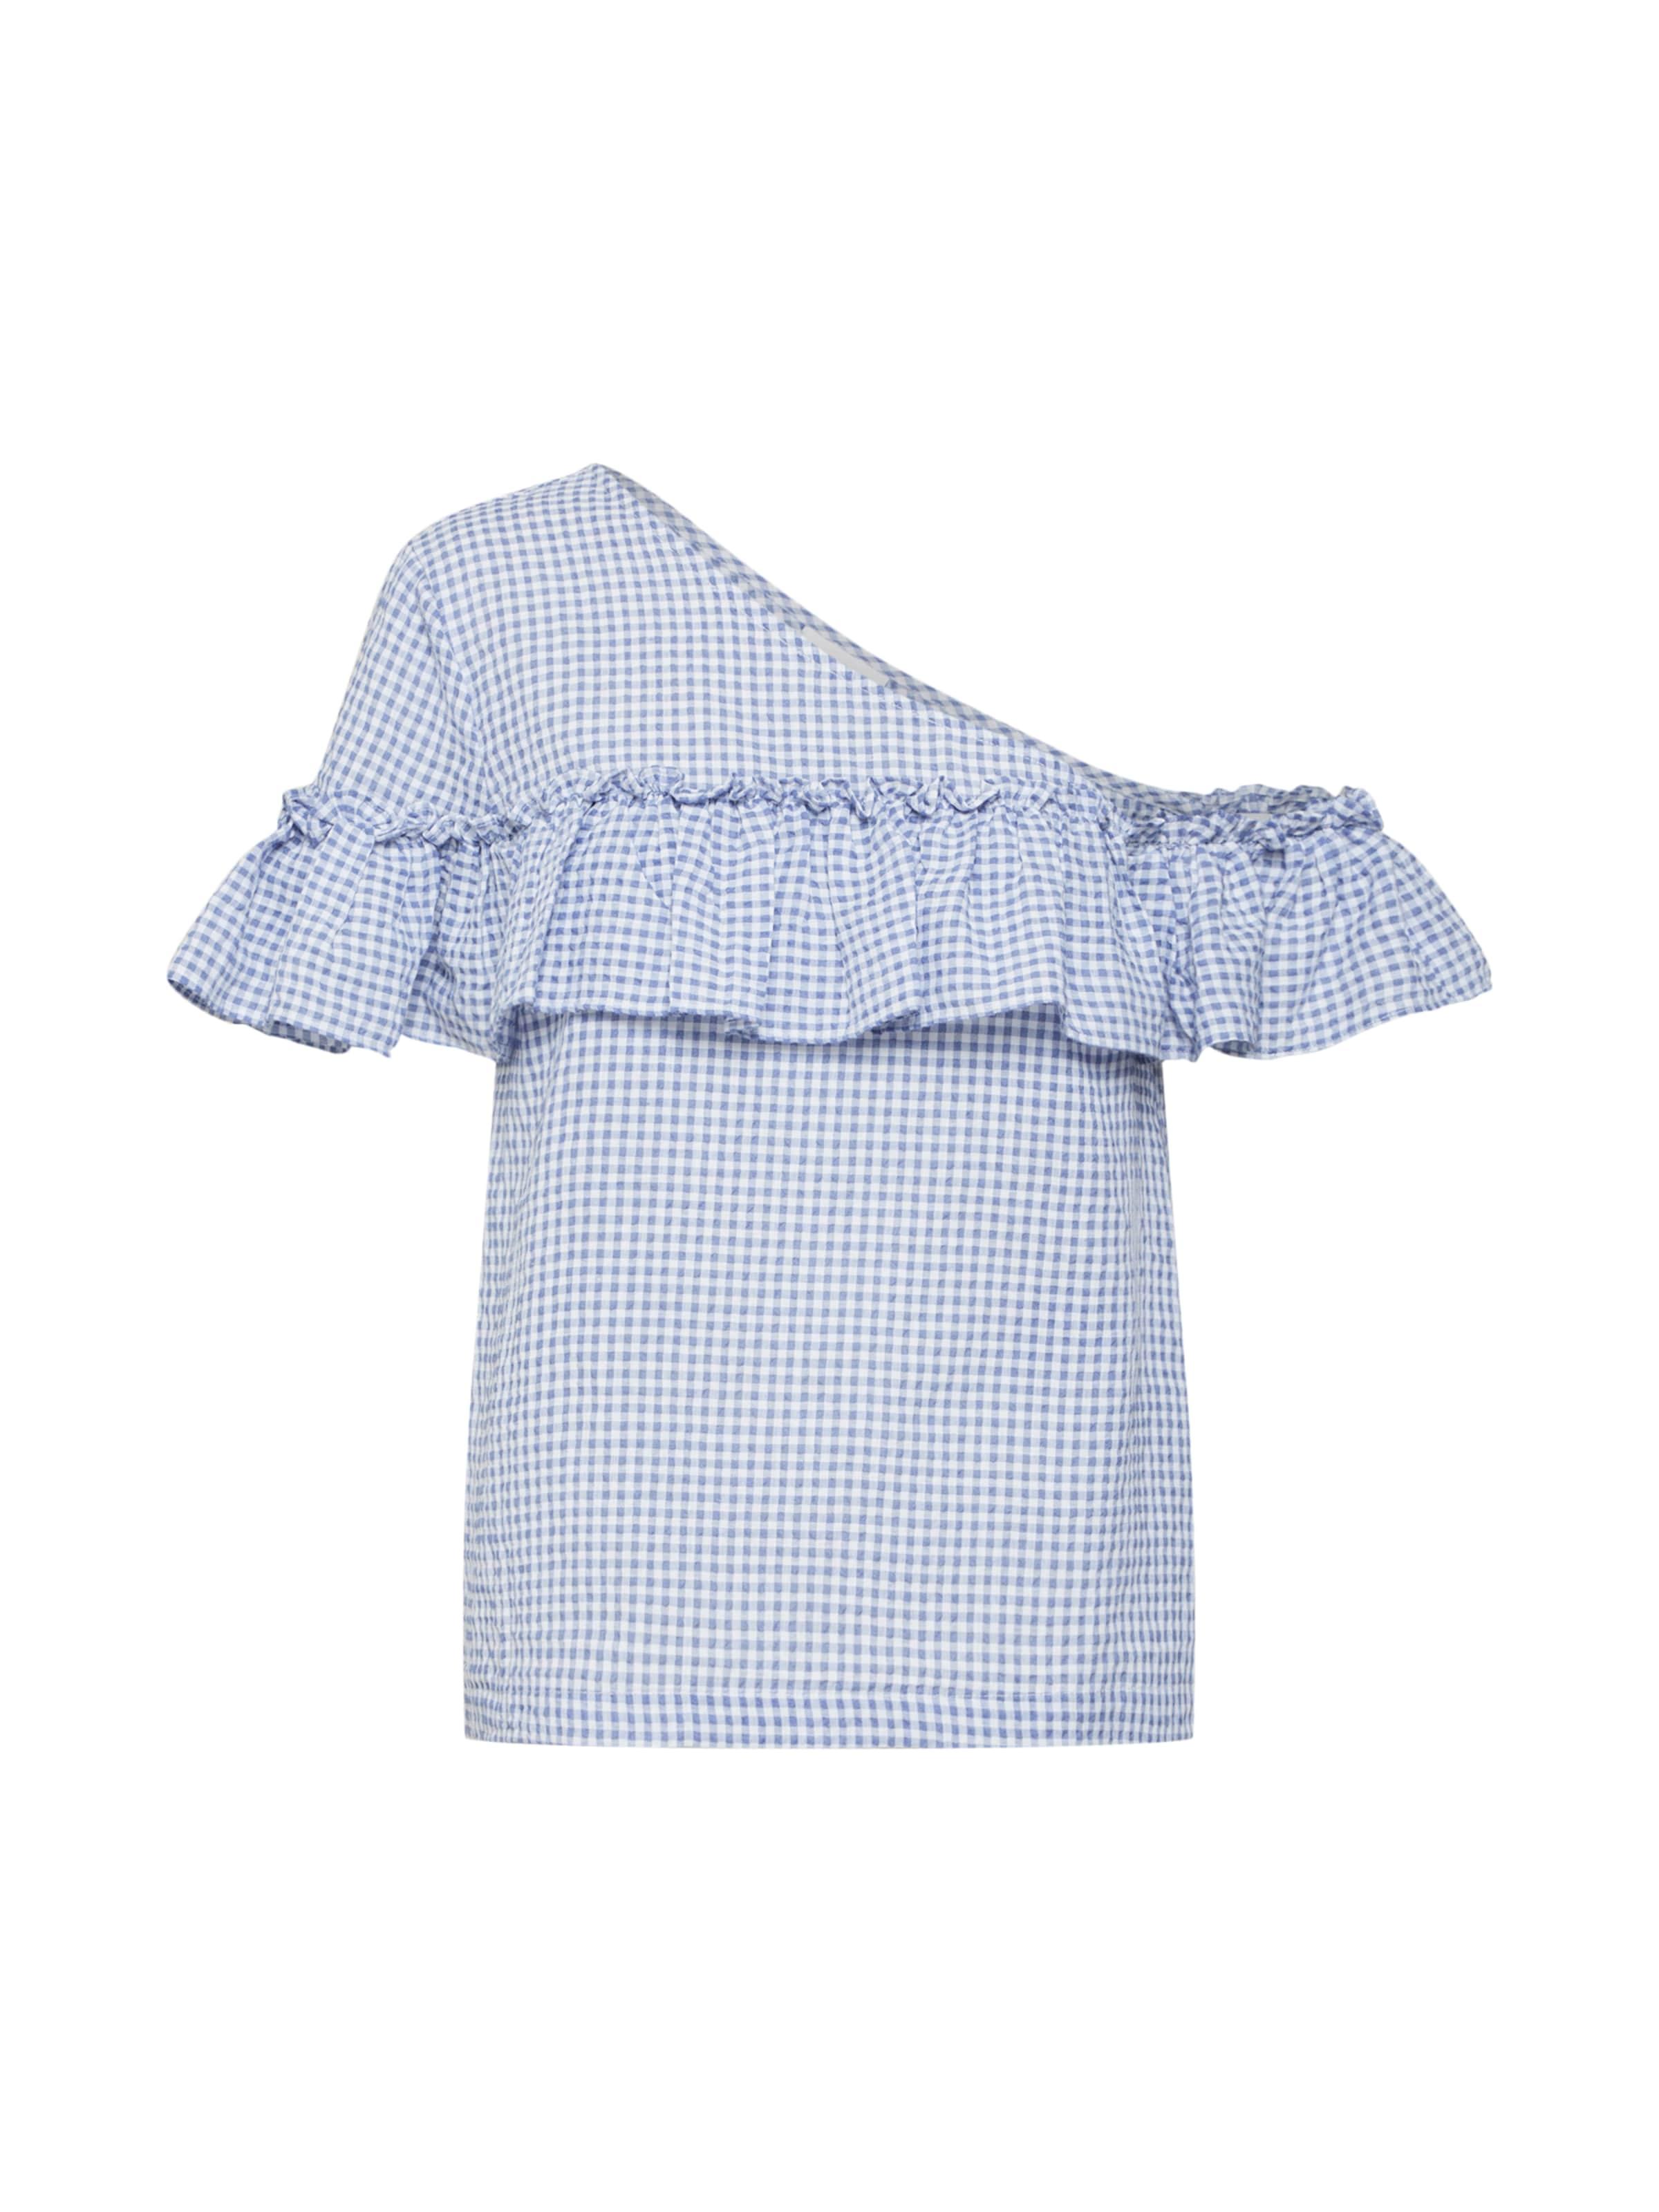 shirt Vila shirt BleuBlanc Vila En T T zVpqSUM